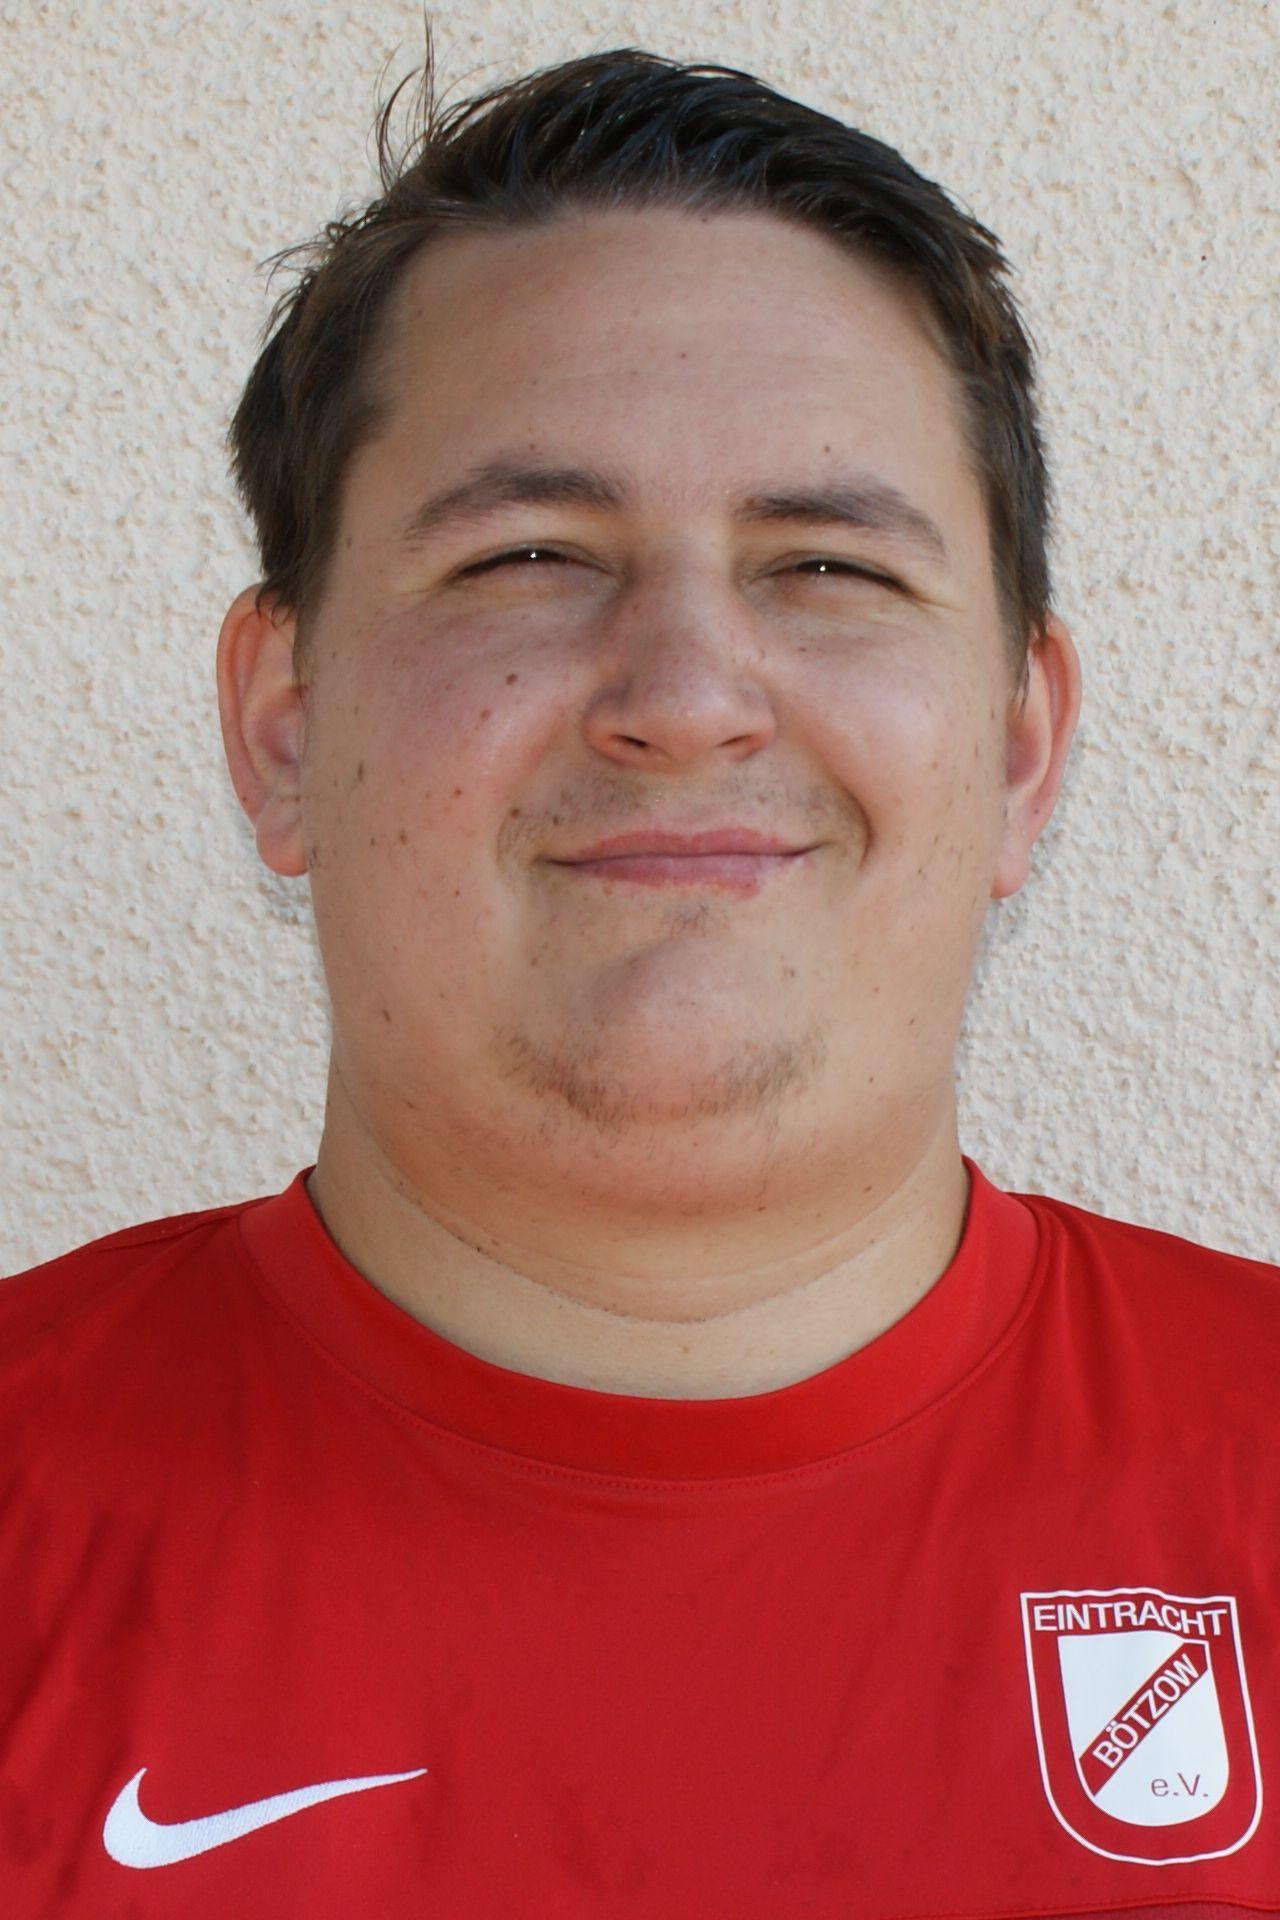 Kevin Perske